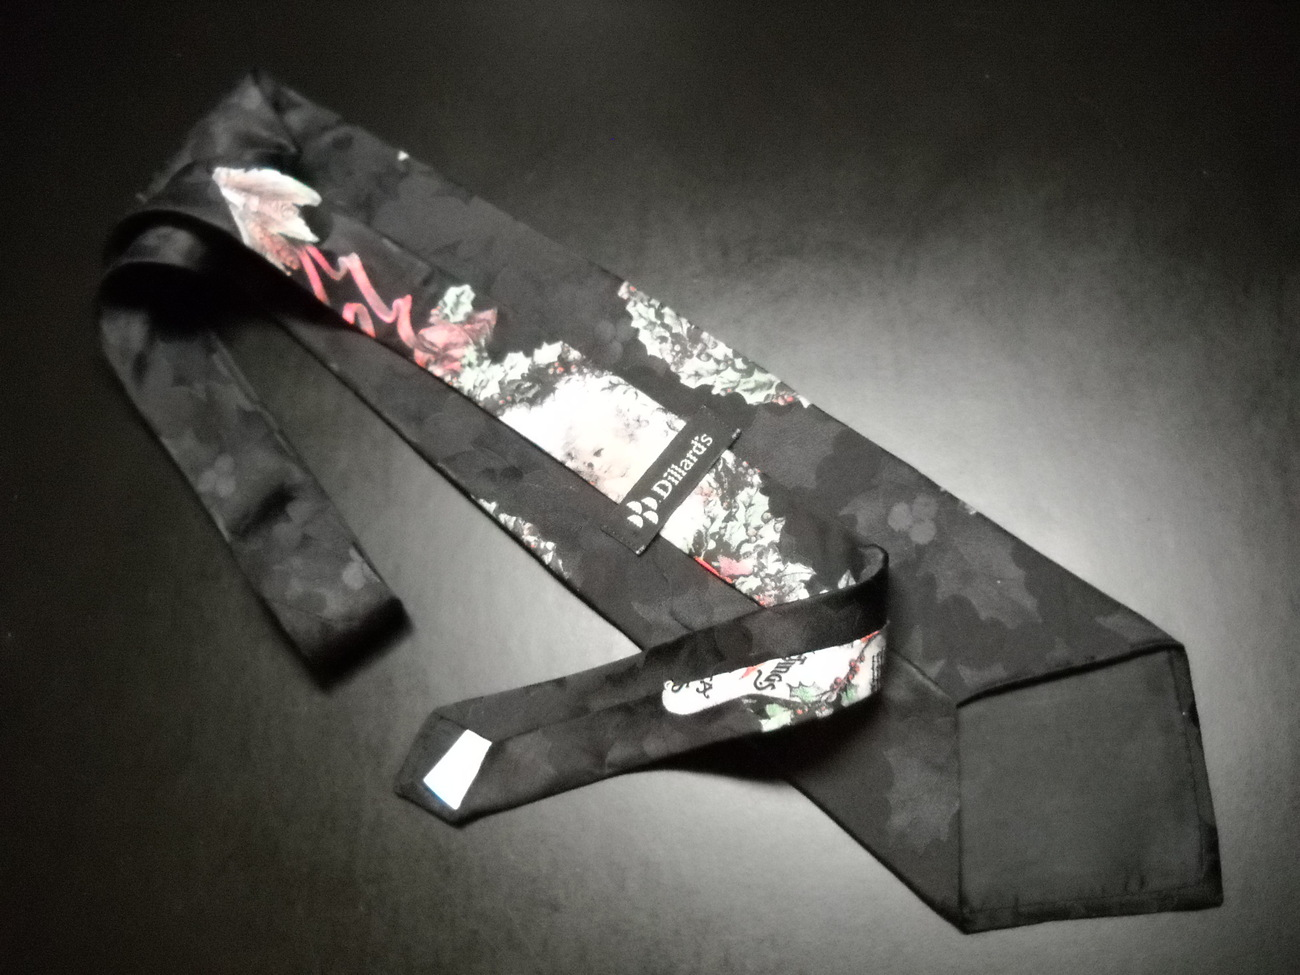 Dillards Christmas Neck Tie Silk Santa and Cherub in Ribboned Wreath on Black